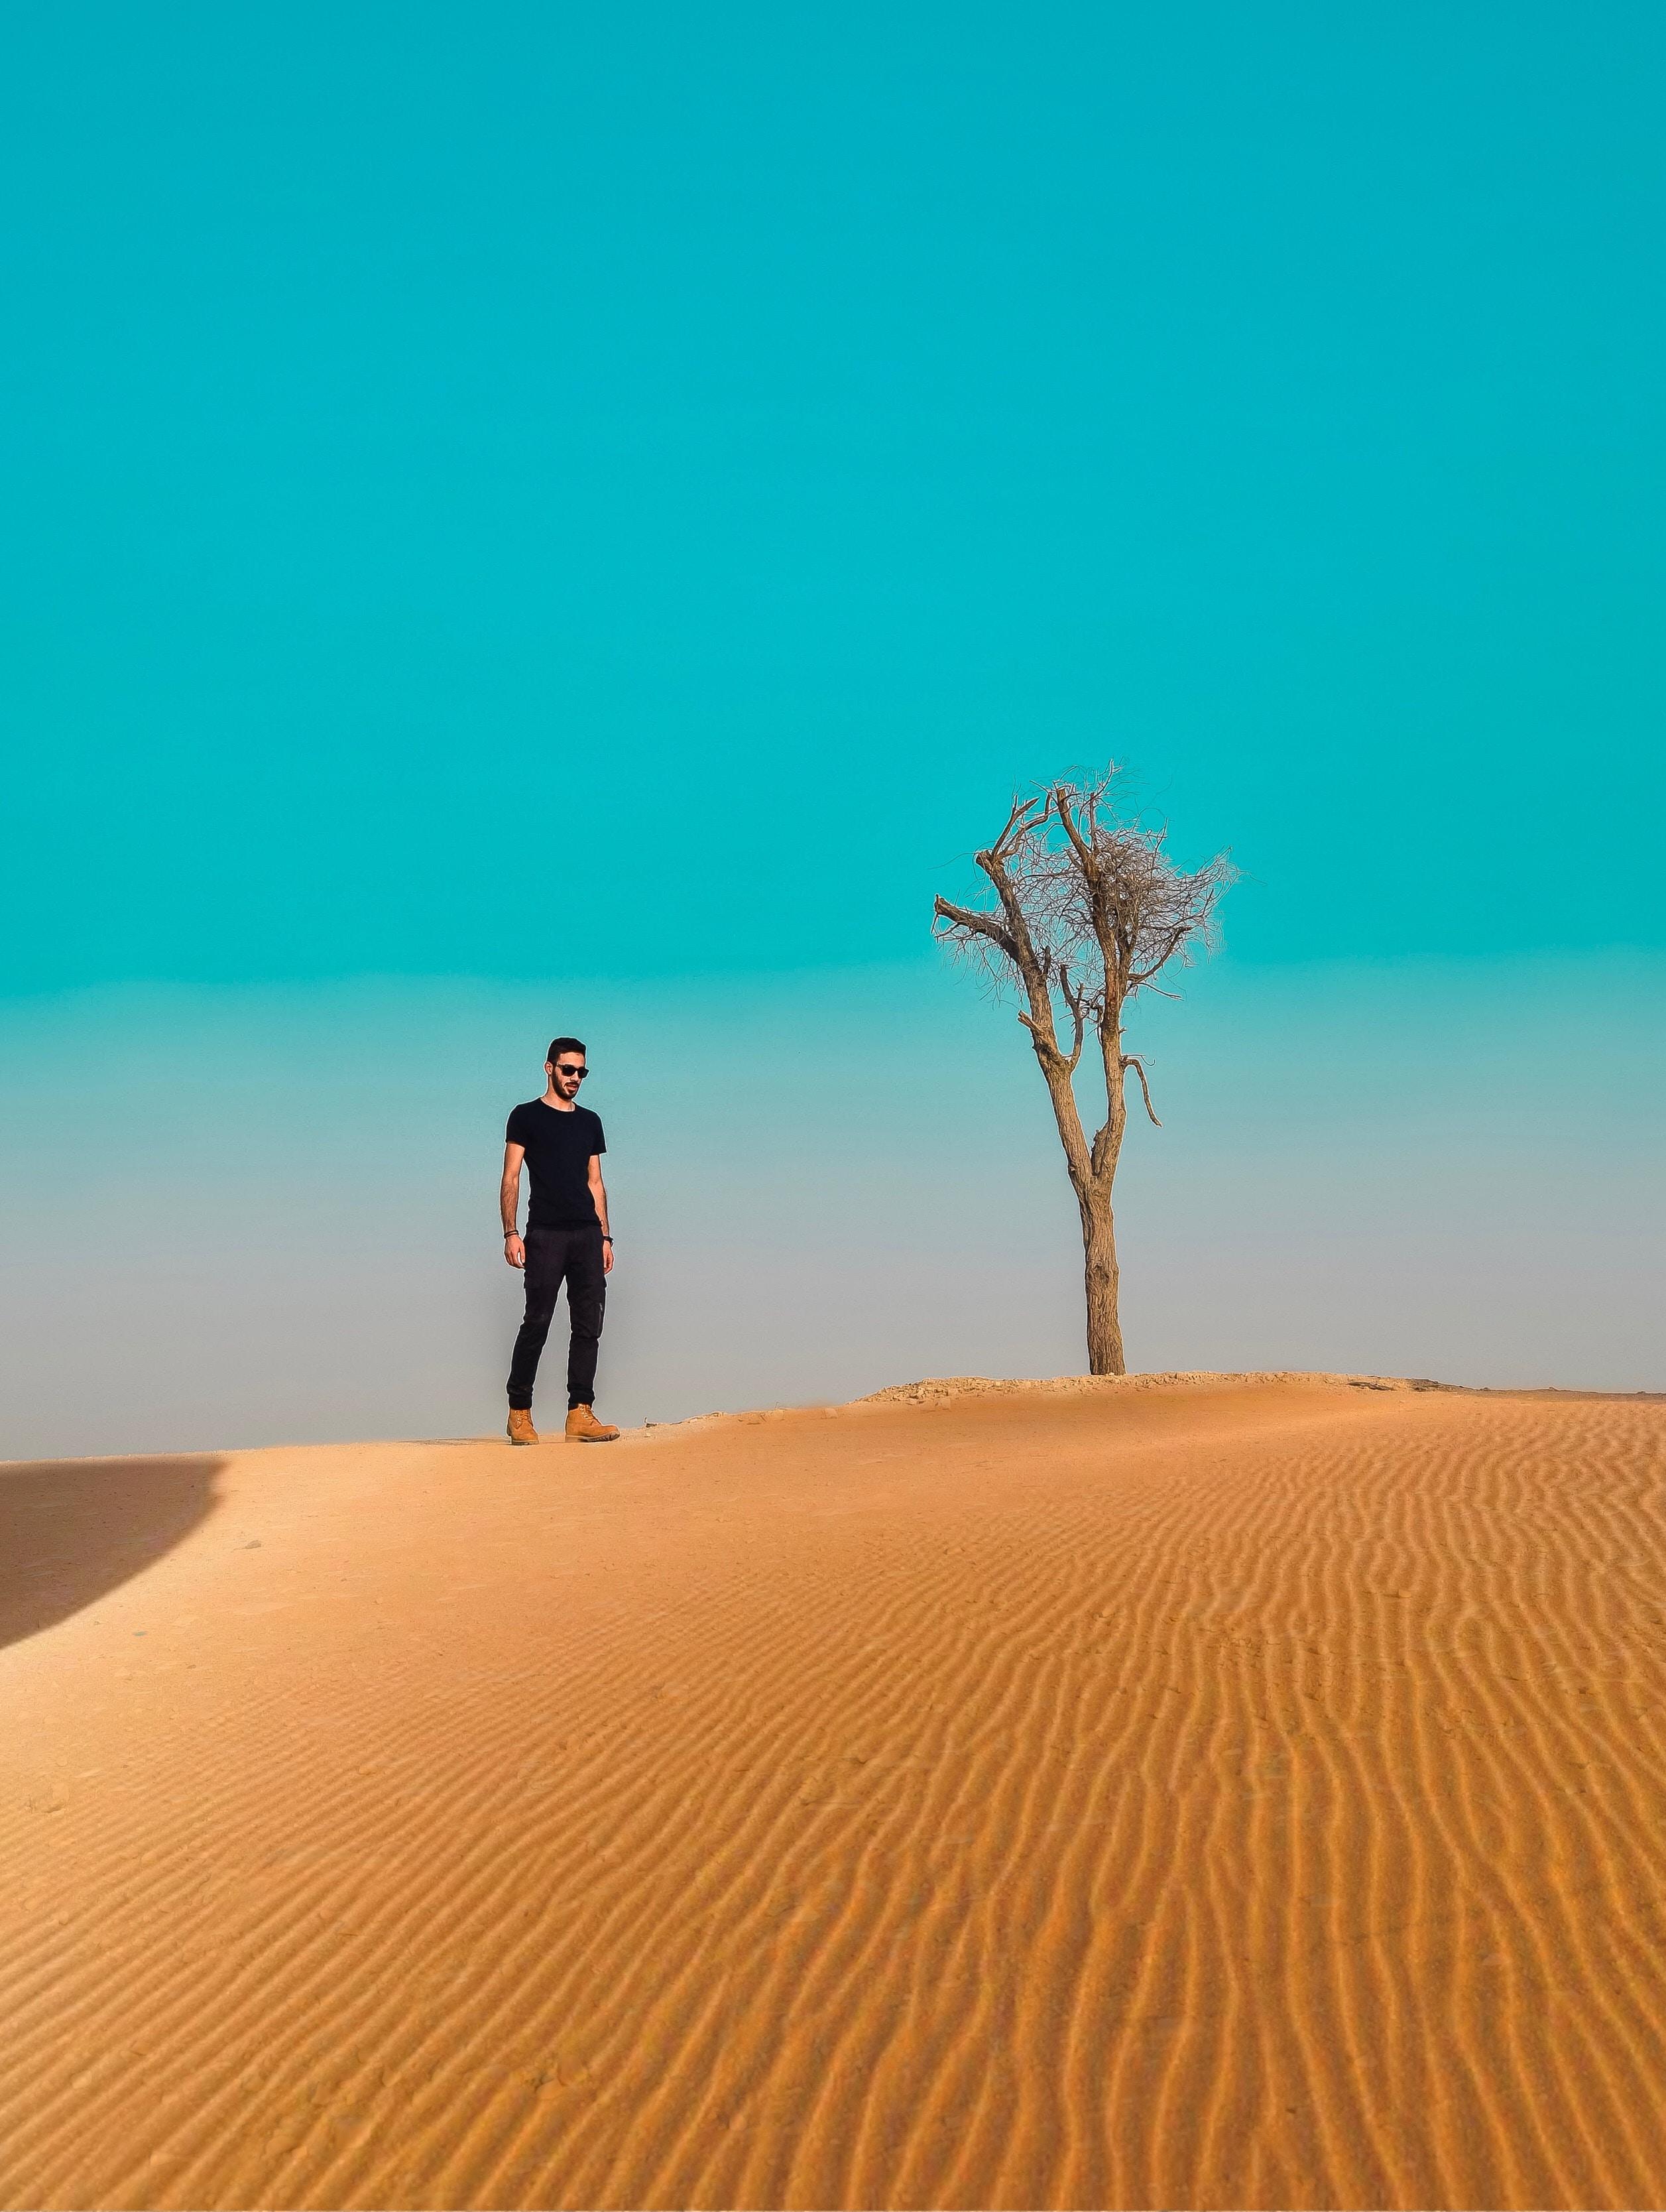 man standing on sand field near dried tree